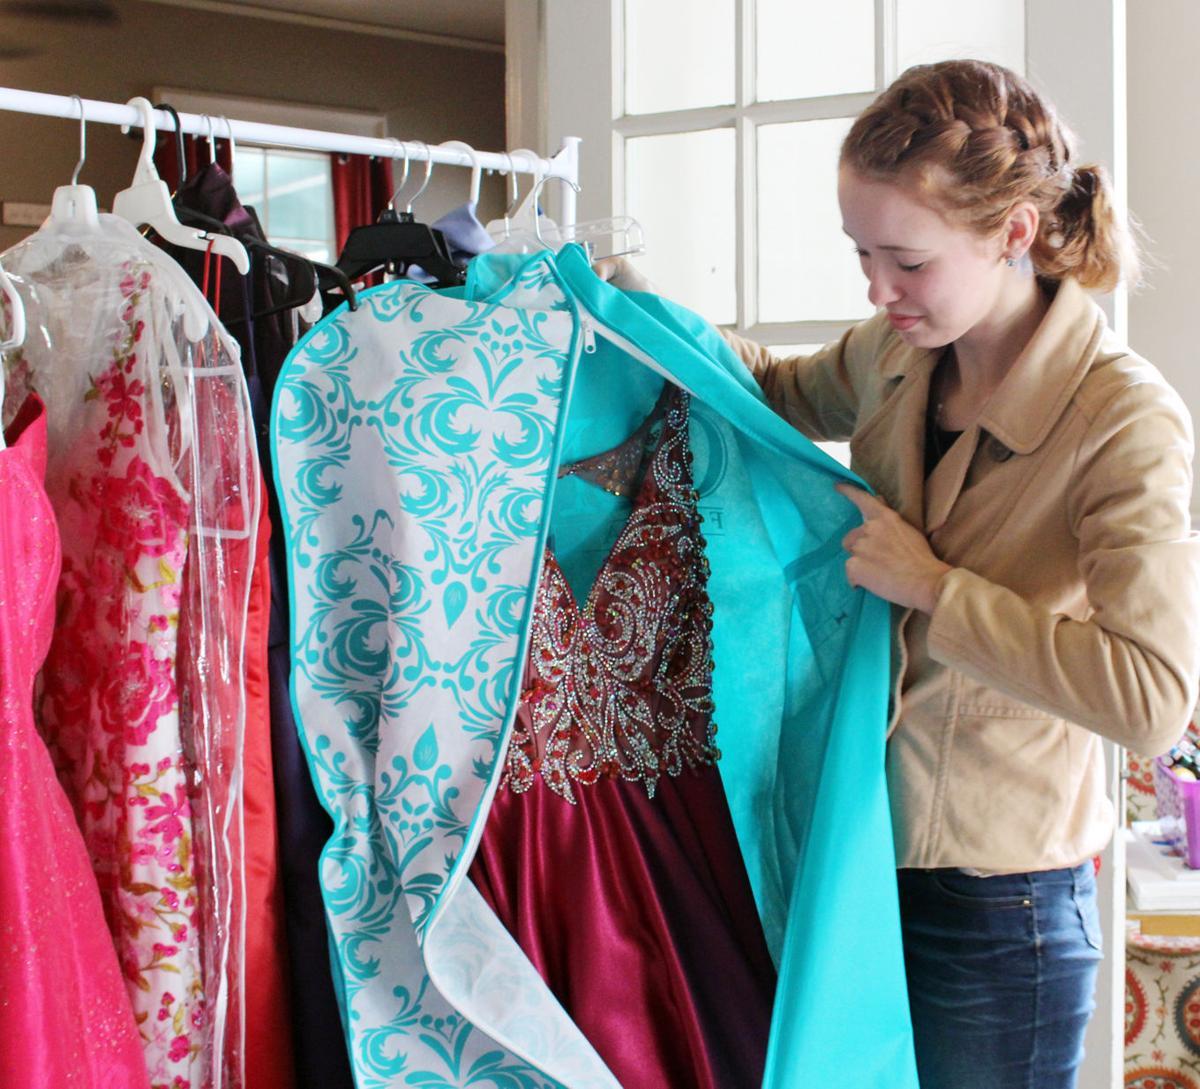 Prom: Local teen starts dress drive | Local News ...